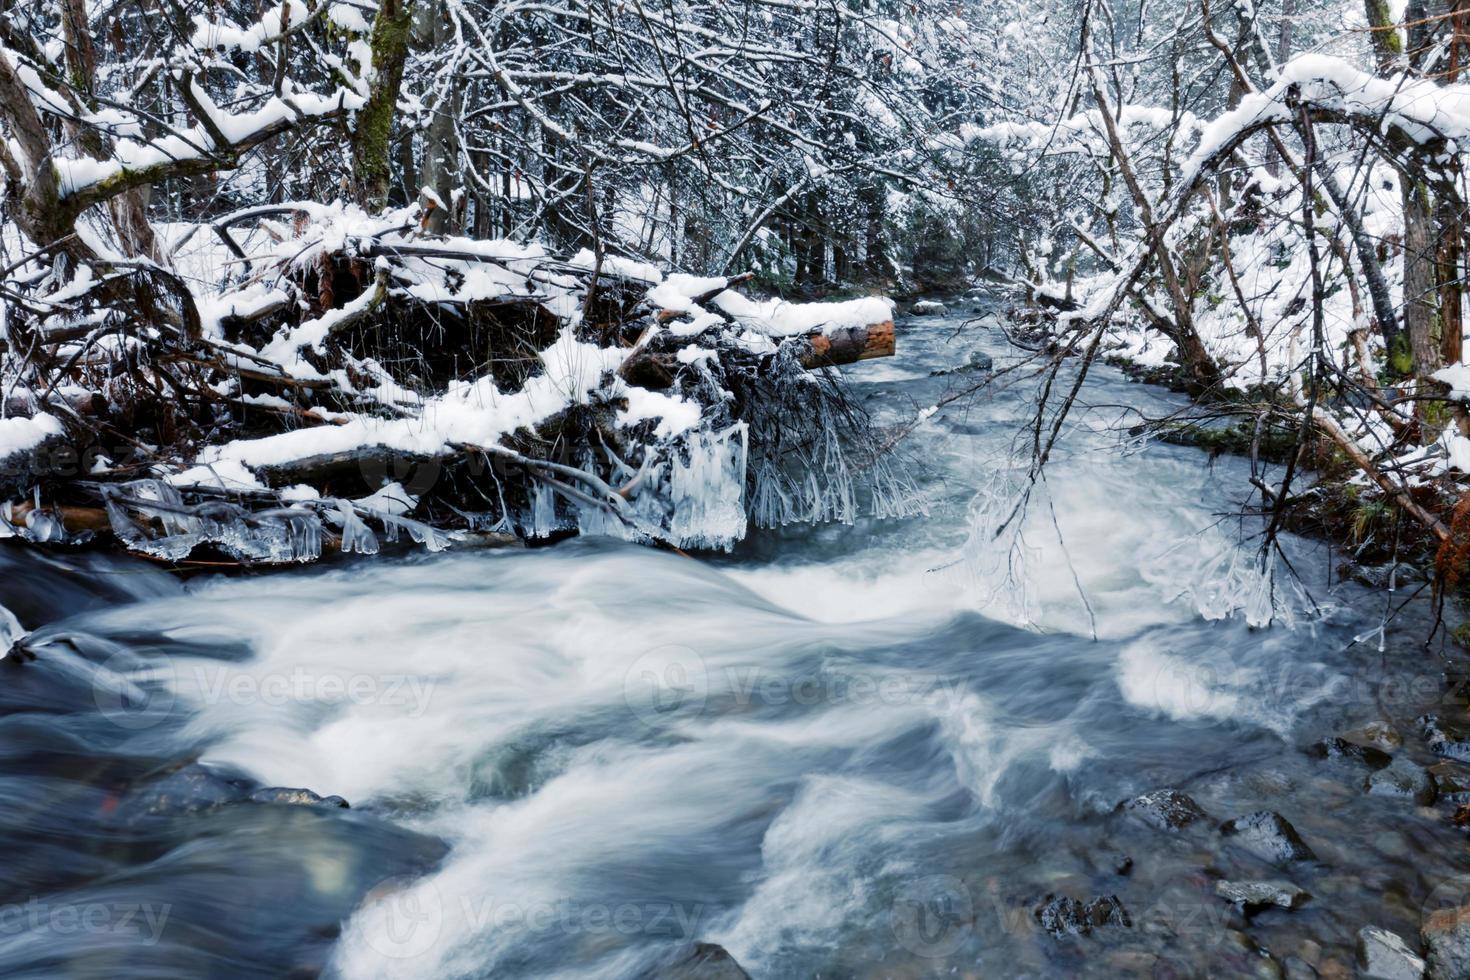 rio no inverno foto